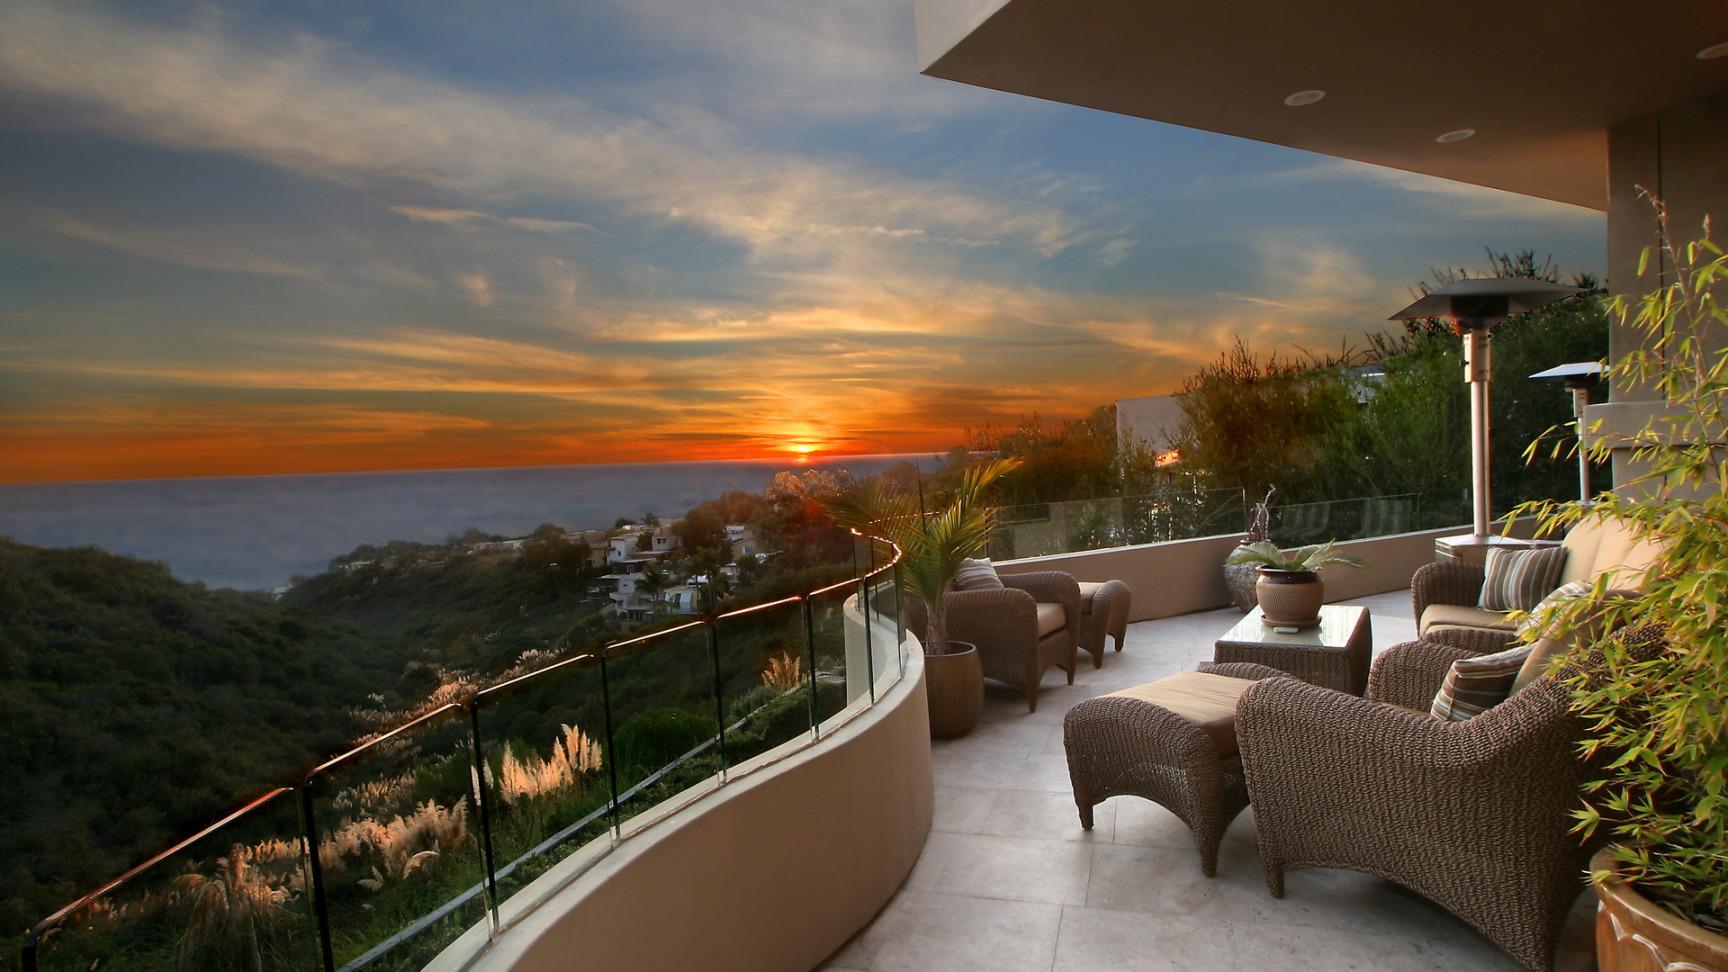 Картинка рассвет, горизорт, балкон, закат, море, природа 136.